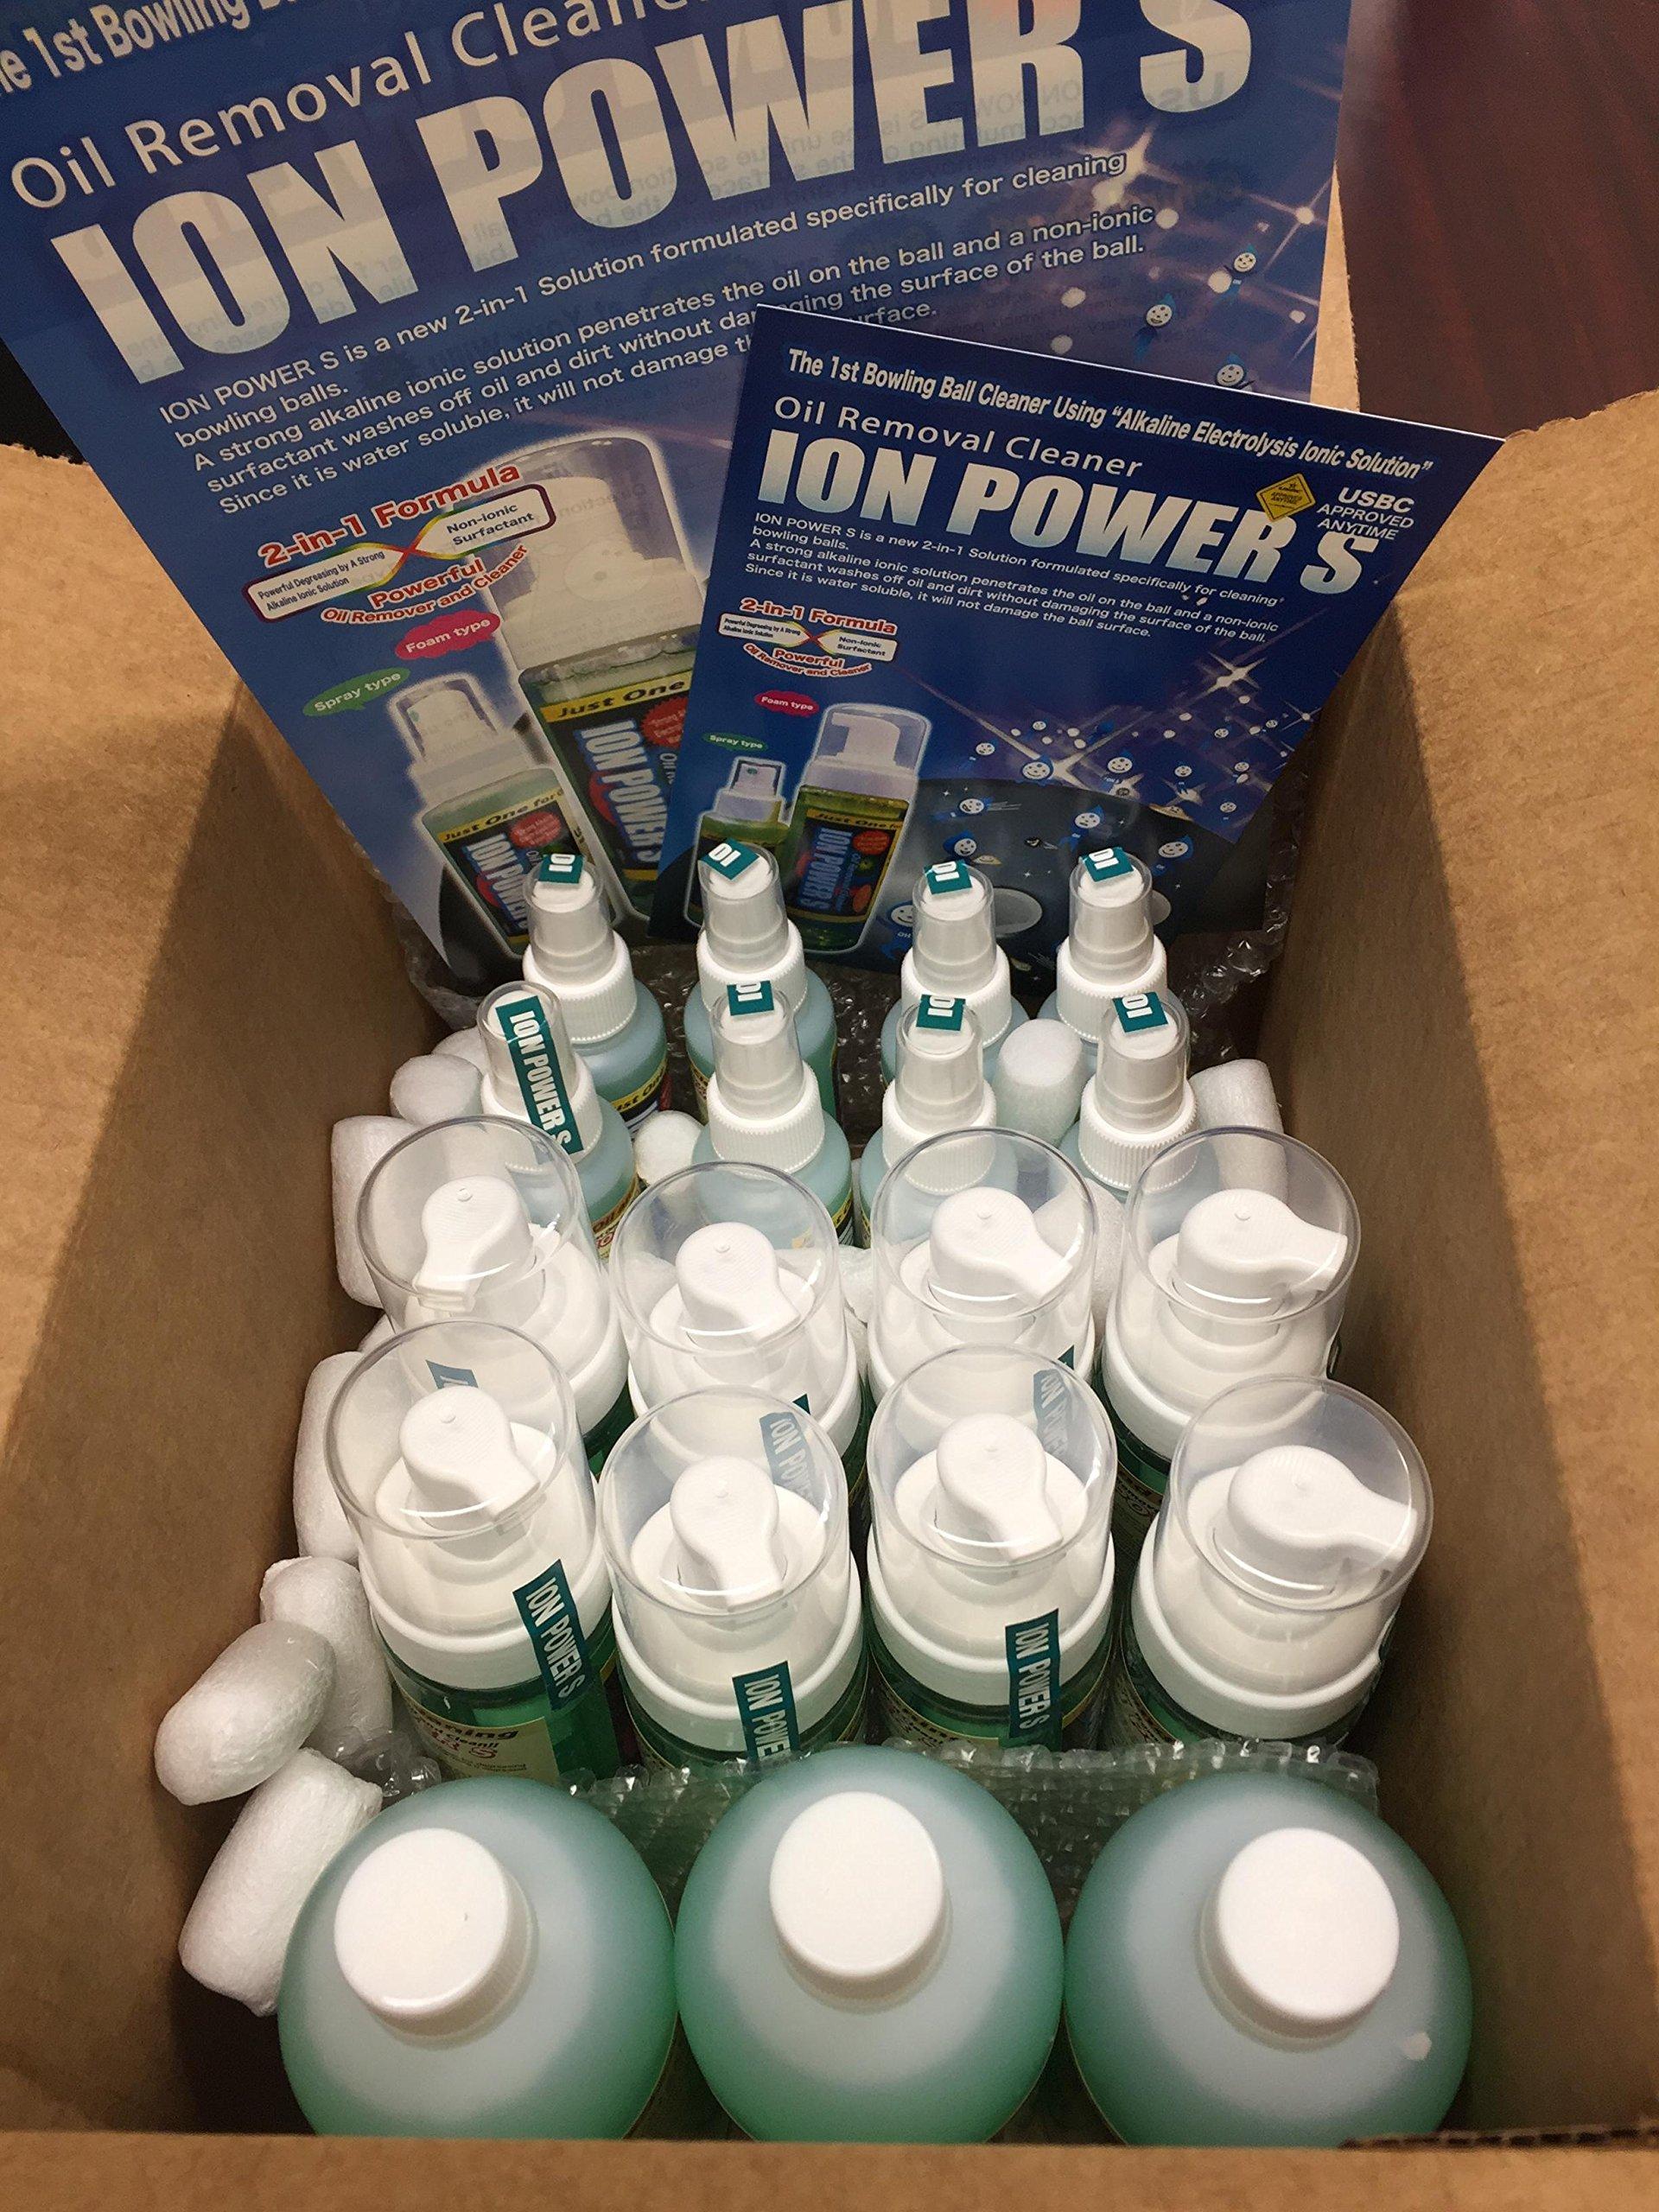 ION POWER S, Bowling Ball Cleaner, Set of Spray (100cc, 3.4 oz) + Refill (500cc, 17 oz)